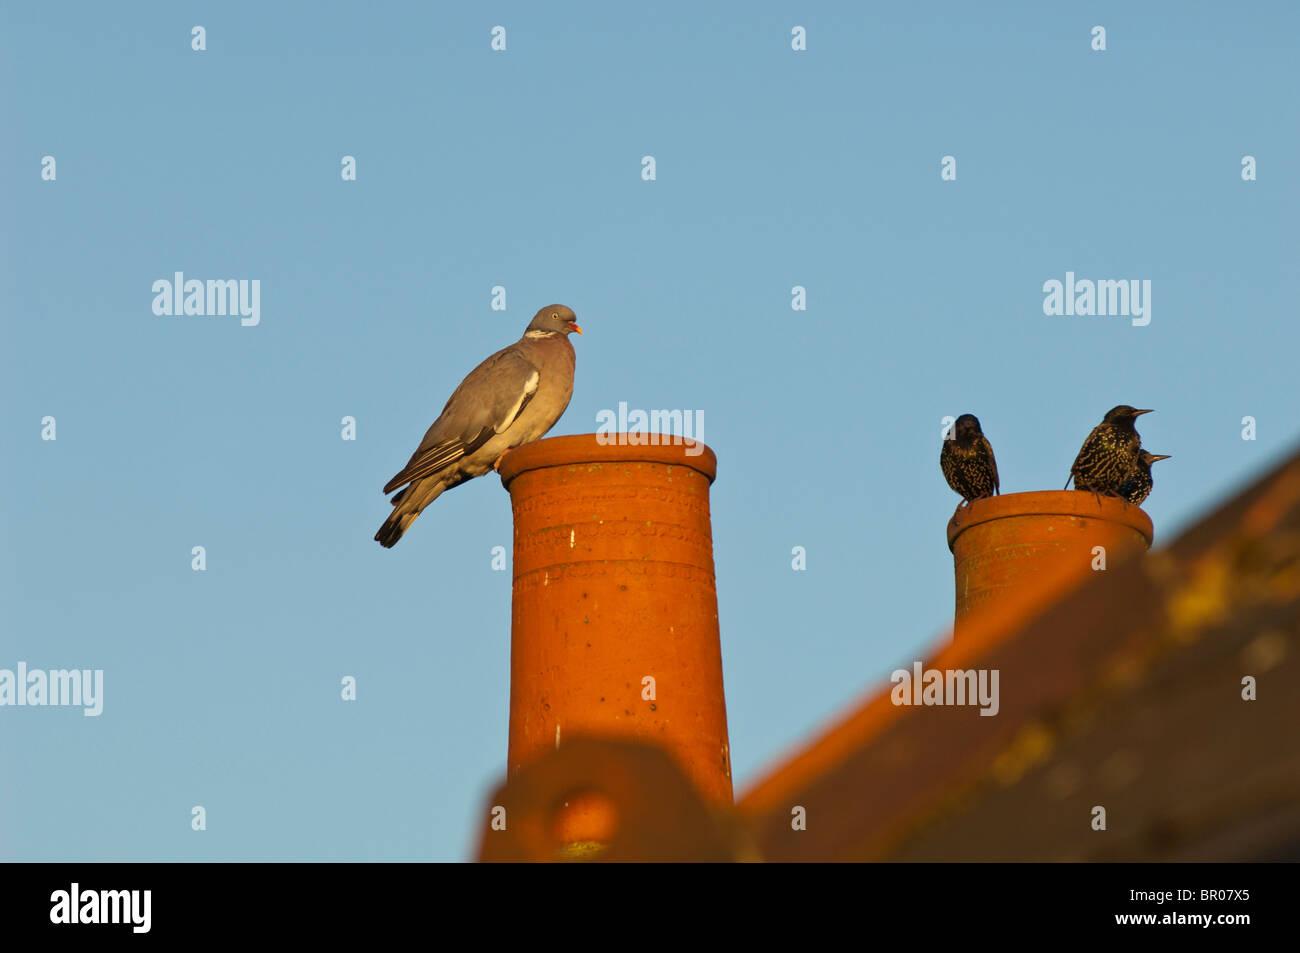 Birds on the roof, London, United Kingdom - Stock Image